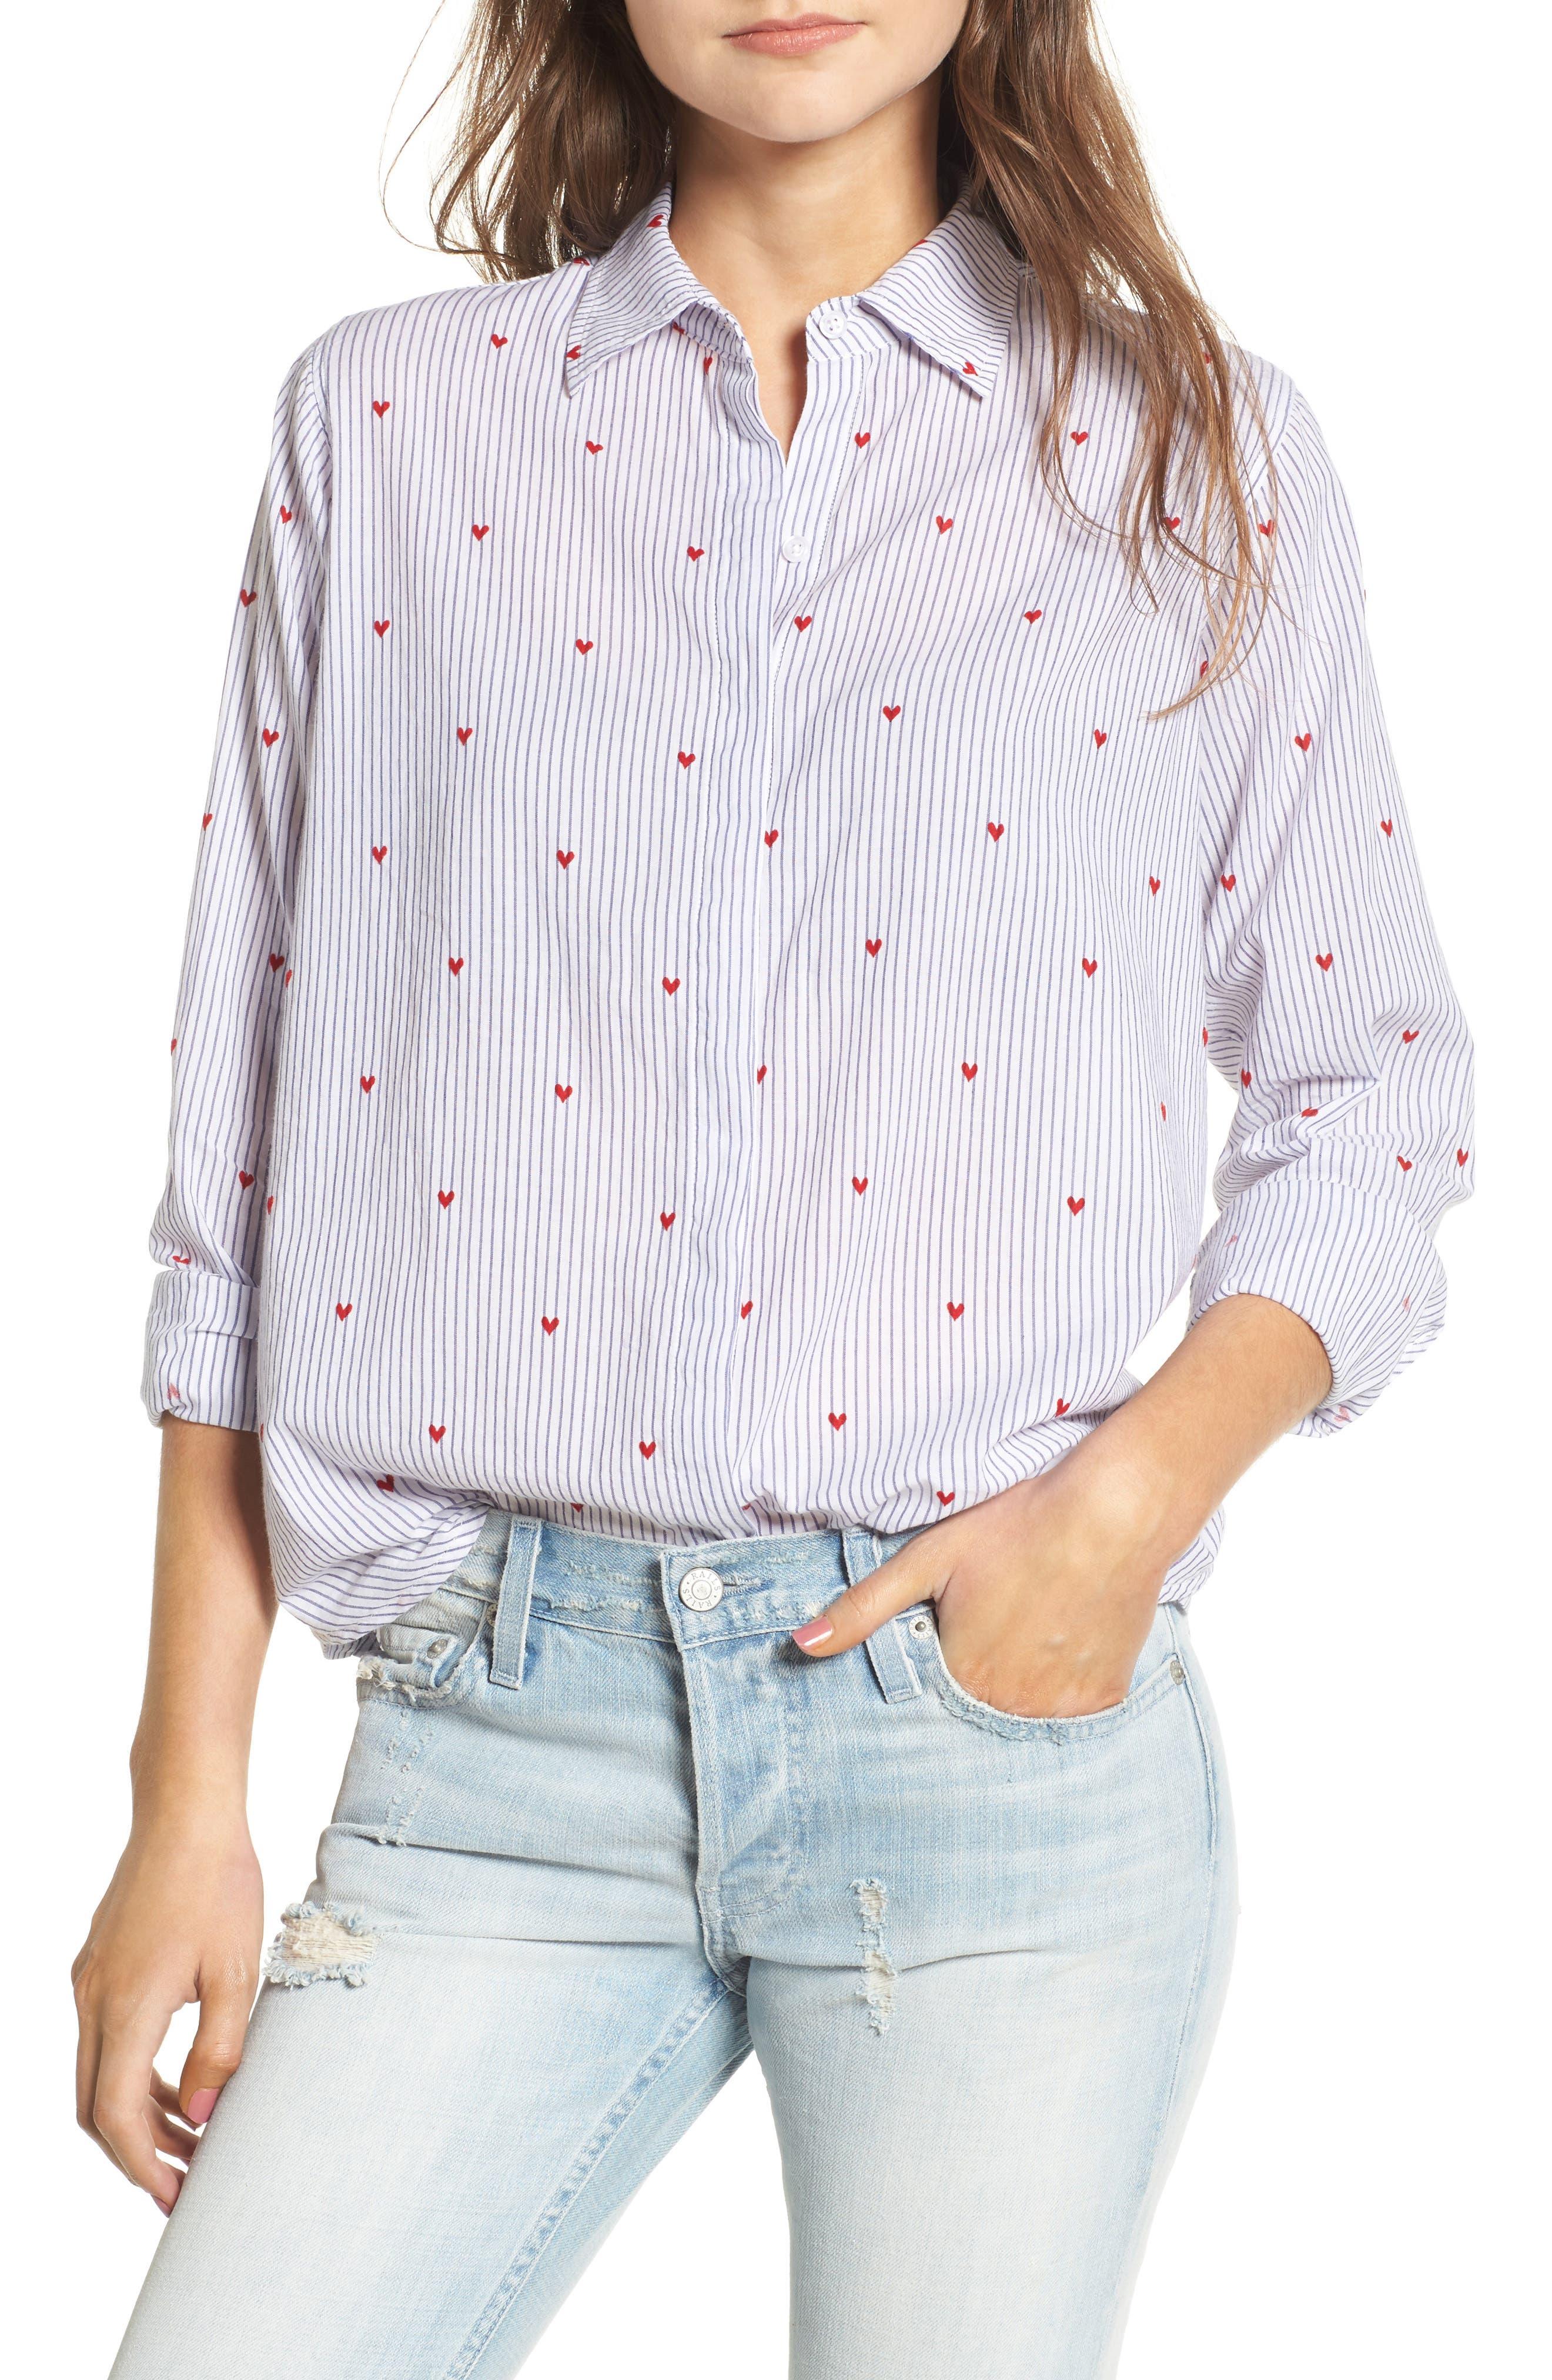 Taylor Heart Stripe Shirt,                         Main,                         color, Girona Stripe With Hearts